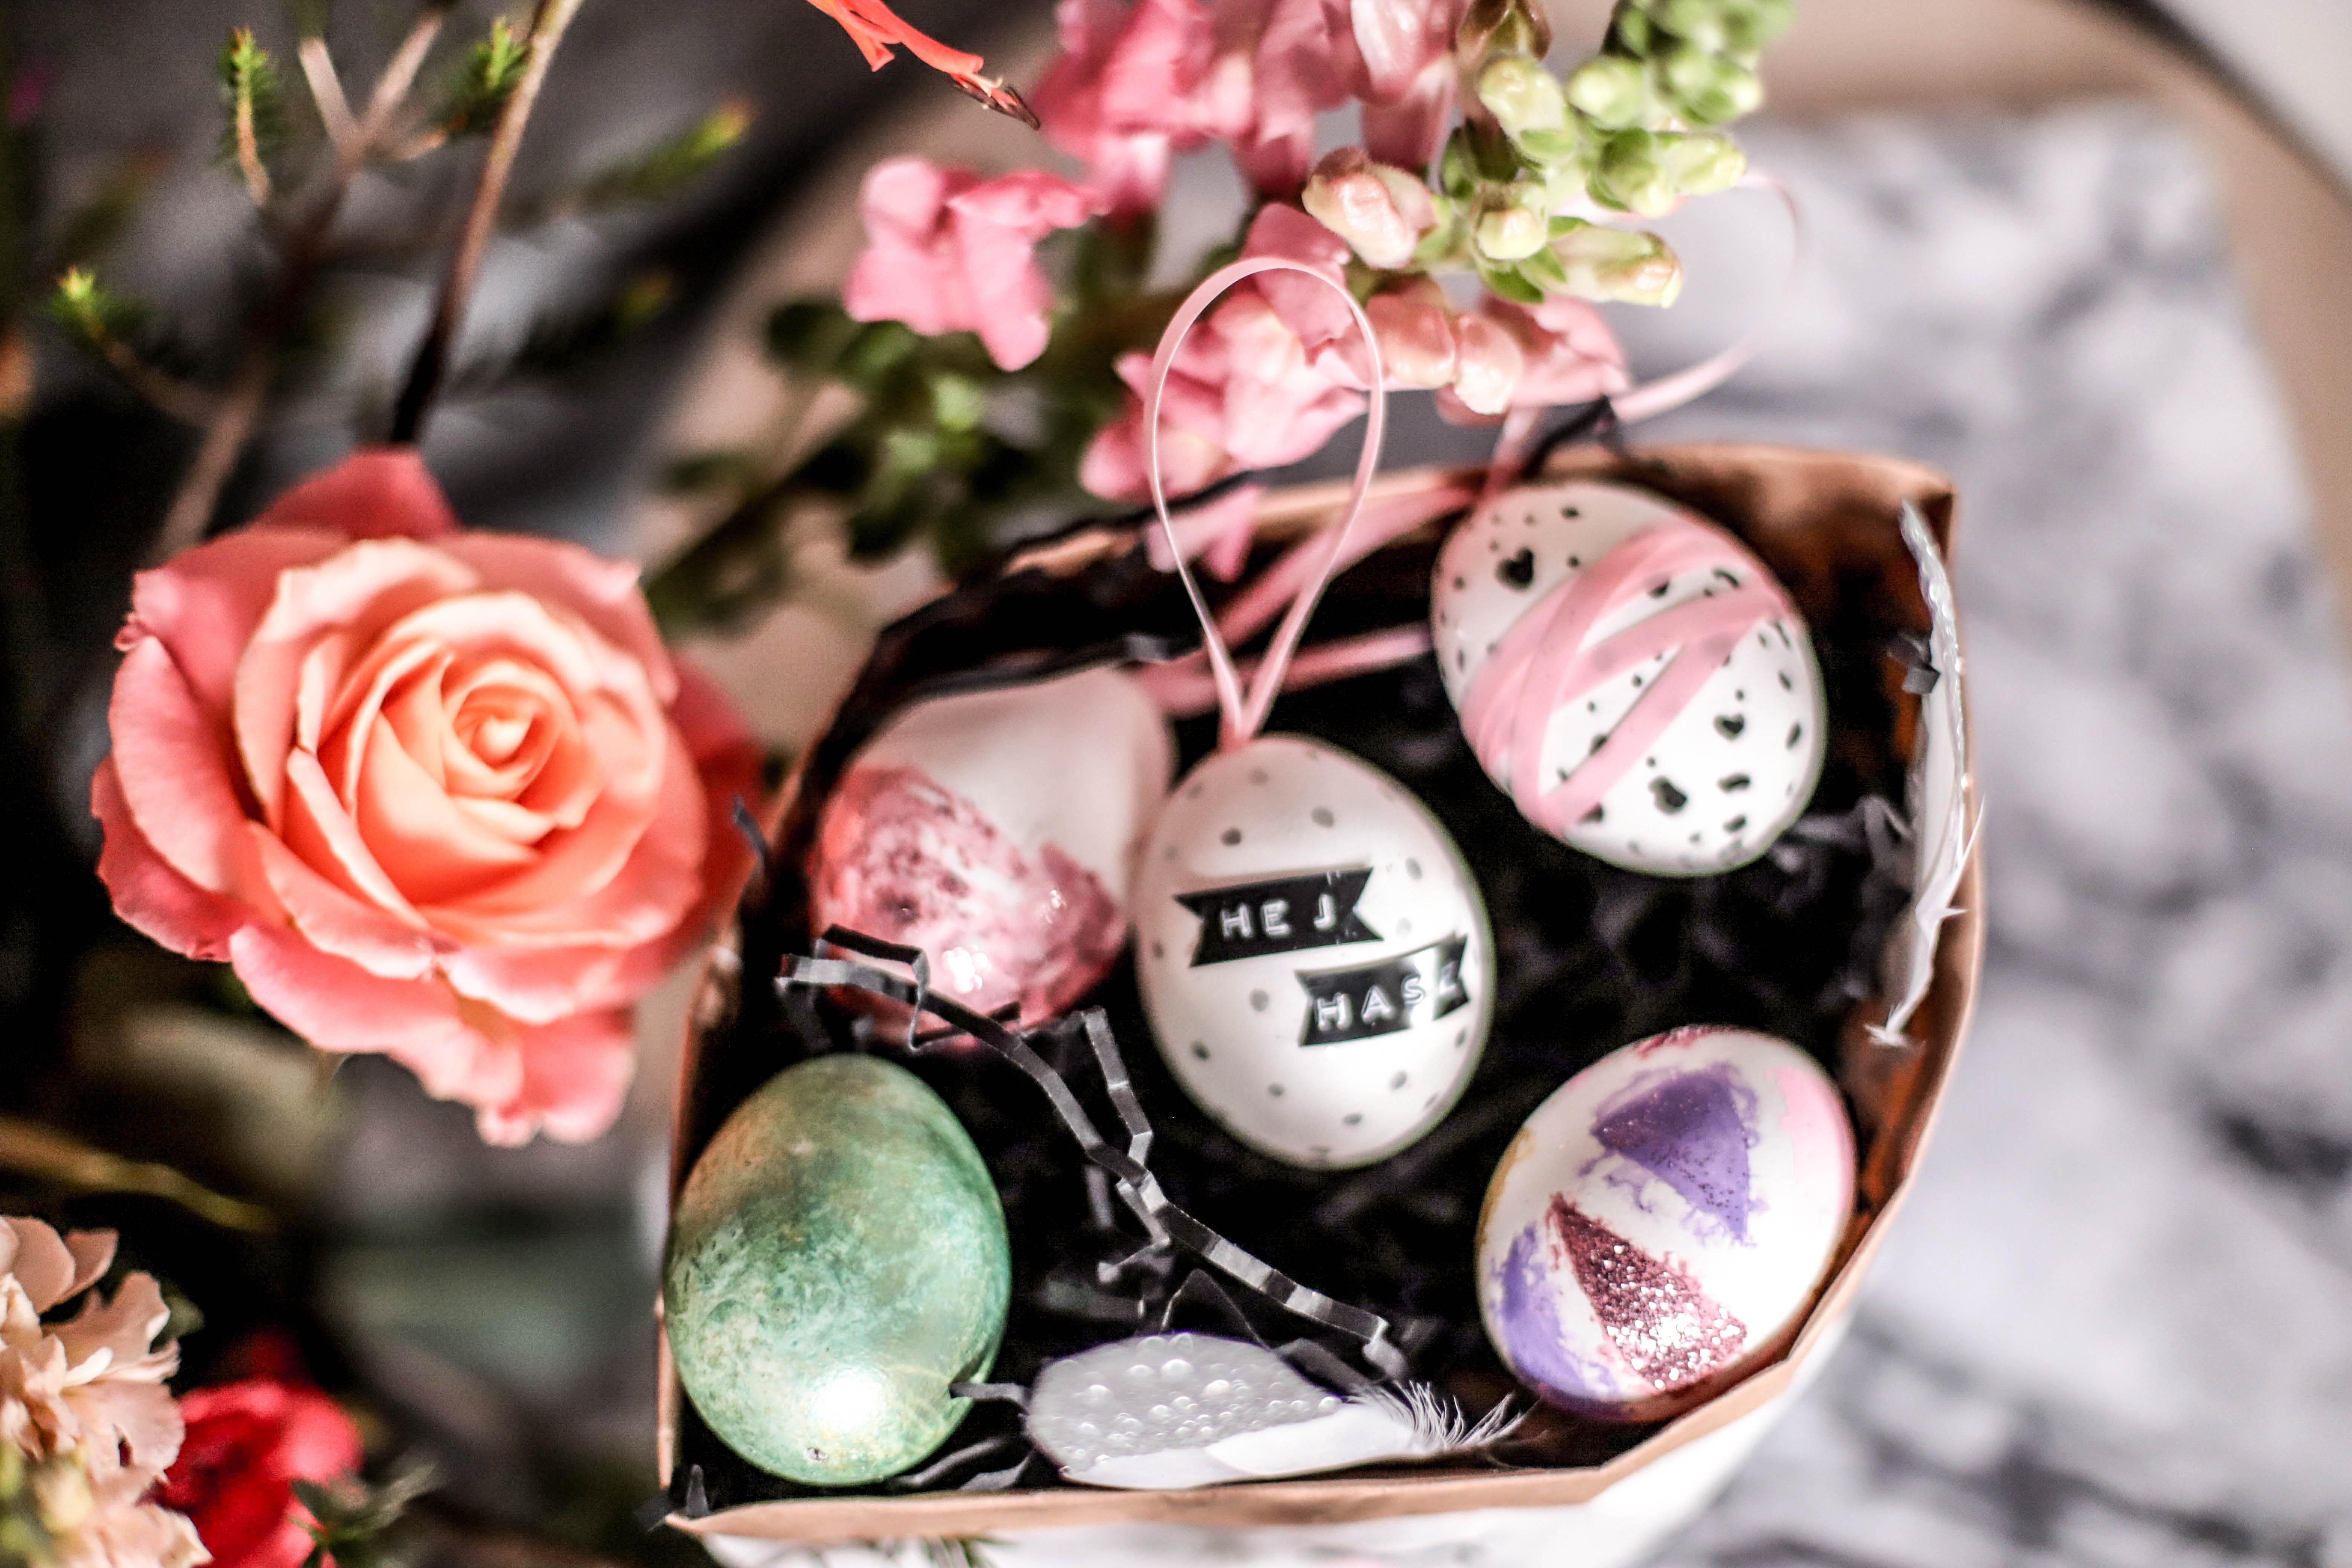 kreative ostereier bemalen mit pintor eier ausblasen leicht gemacht mein tipp sch nwild. Black Bedroom Furniture Sets. Home Design Ideas